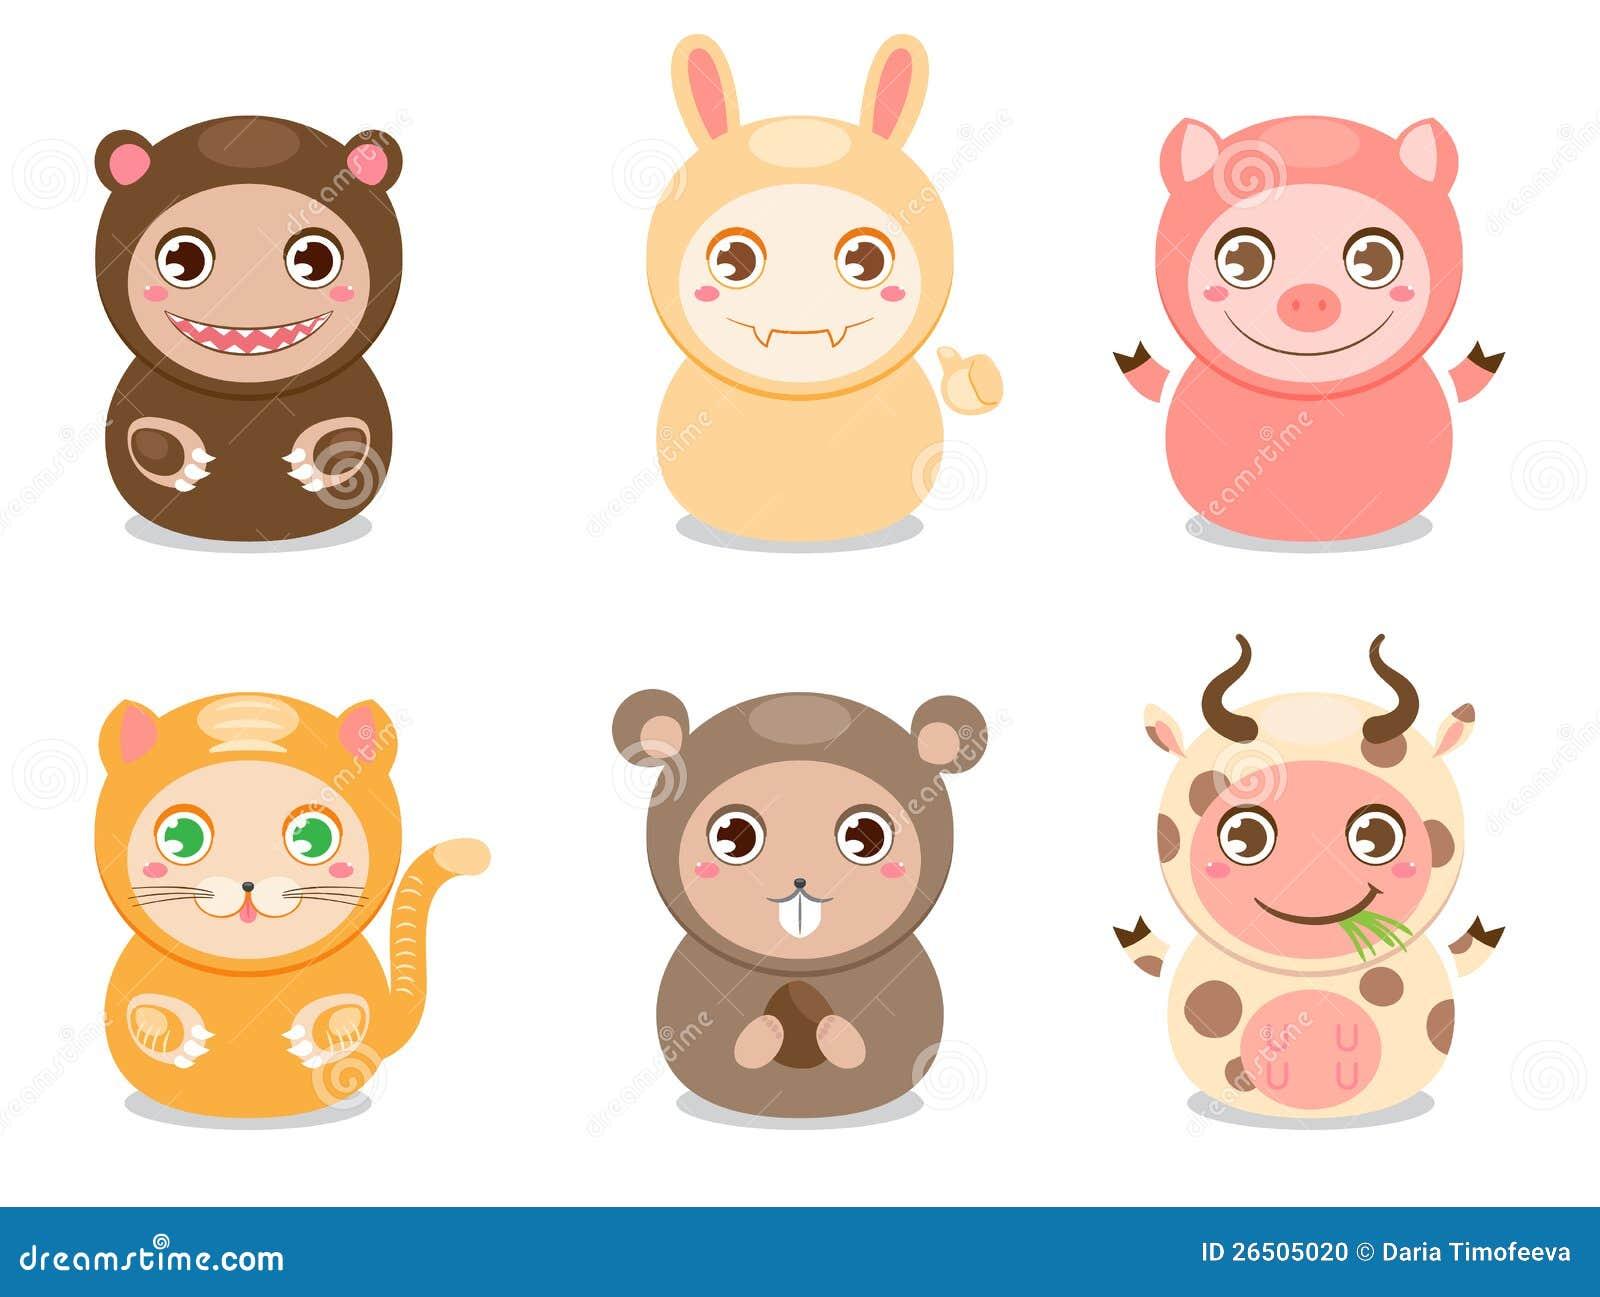 Cute Cartoon Animals Stock Photo Image 26505020